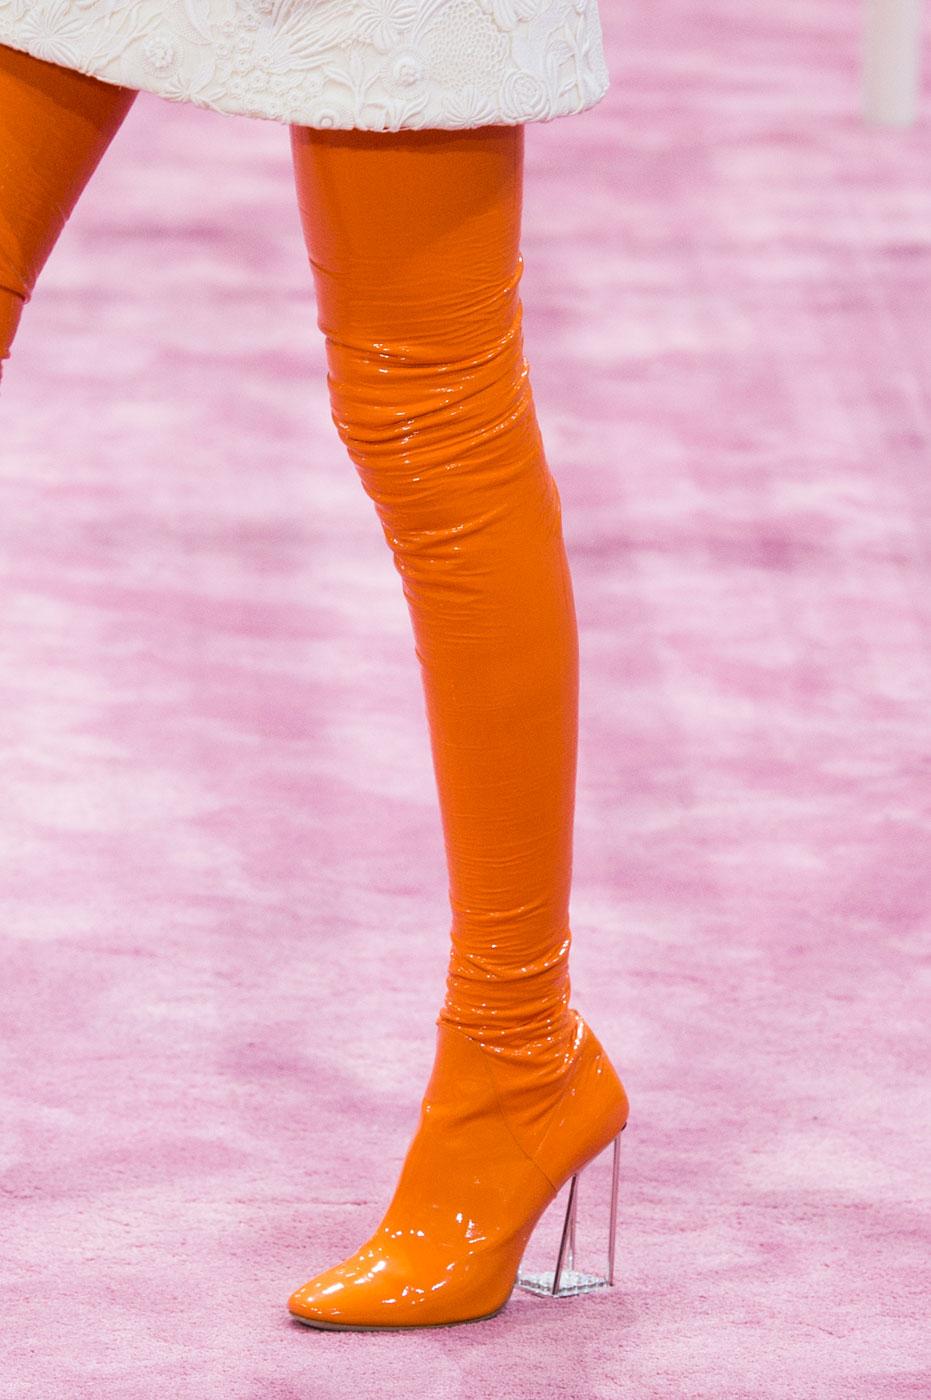 Christian-Dior-fashion-runway-show-close-ups-haute-couture-paris-spring-summer-2015-the-impression-201